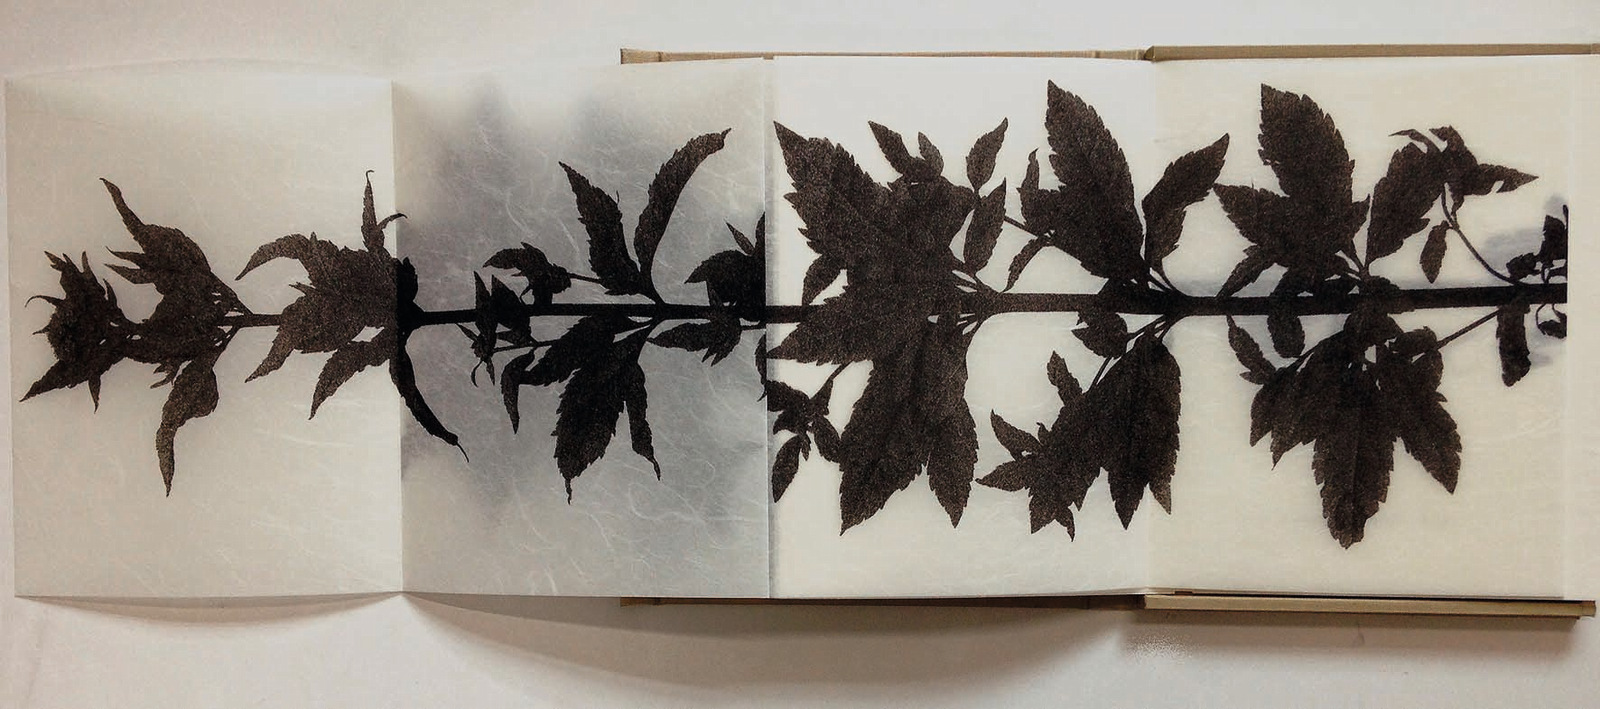 Motoko Tachikawa – Unwanted Plant.